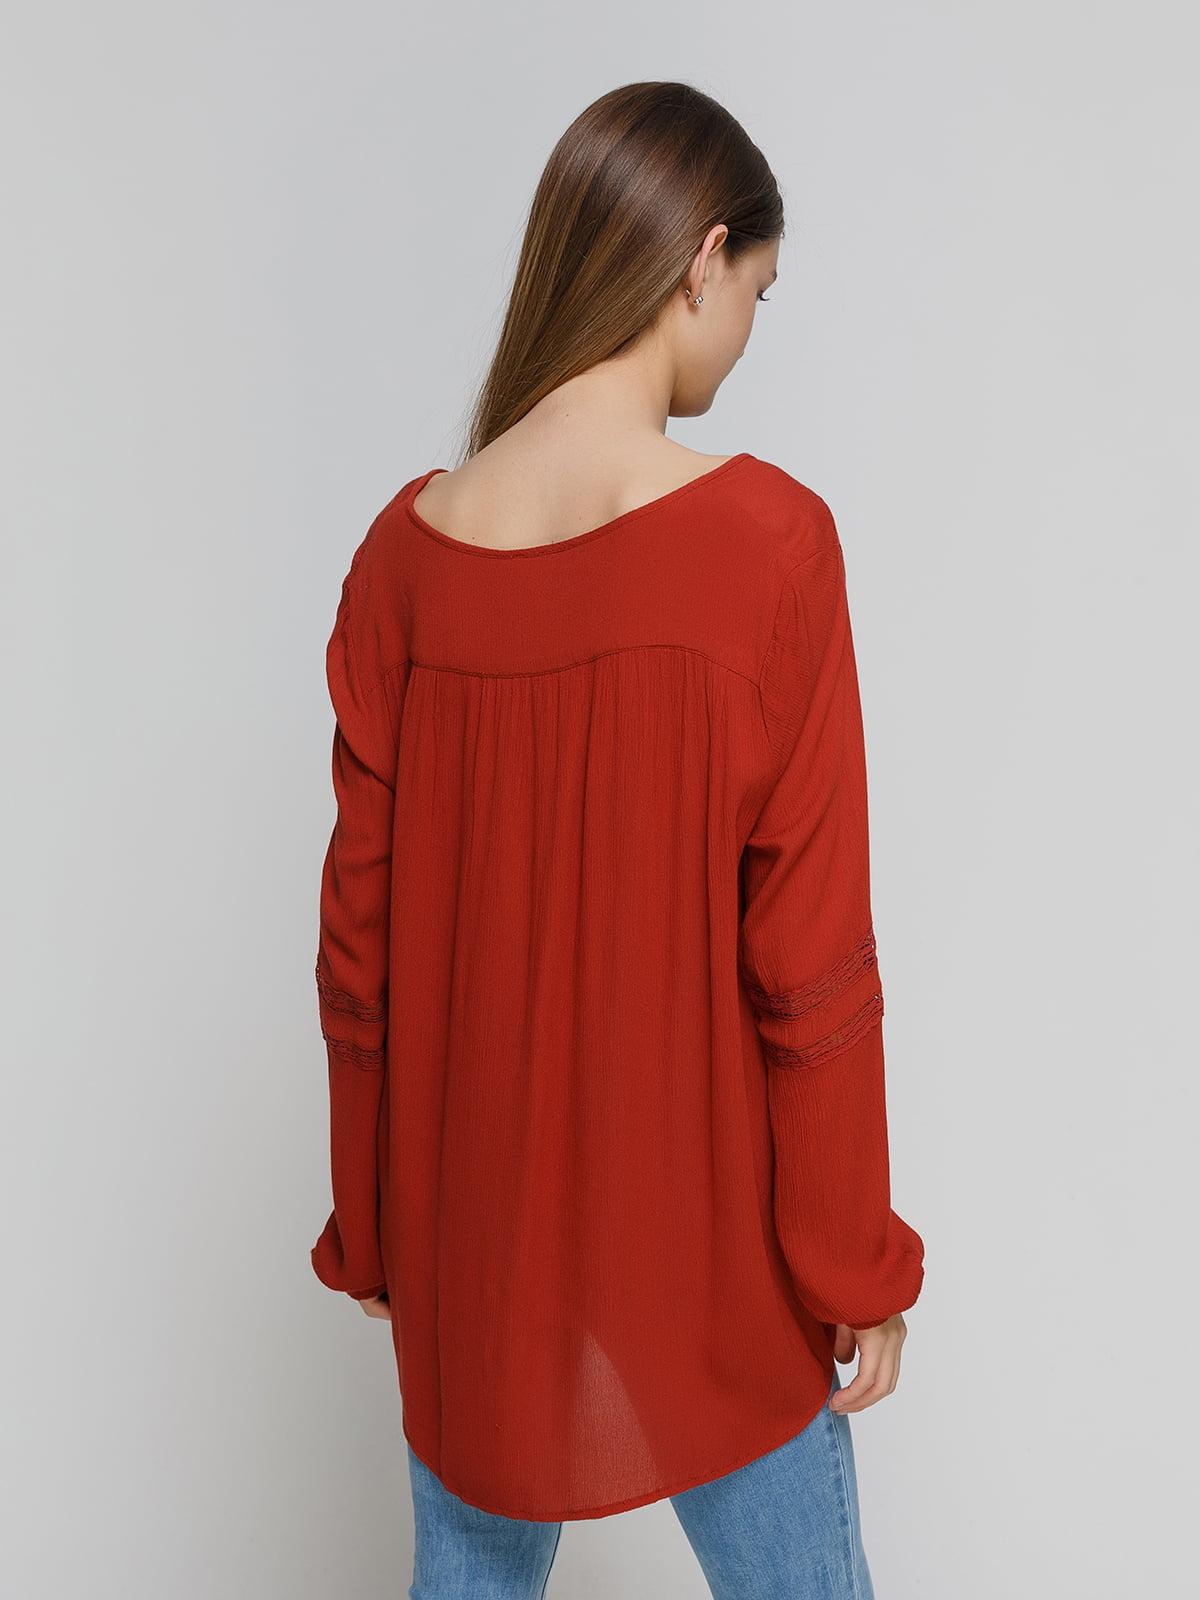 Блуза терракотовая   4628327   фото 2